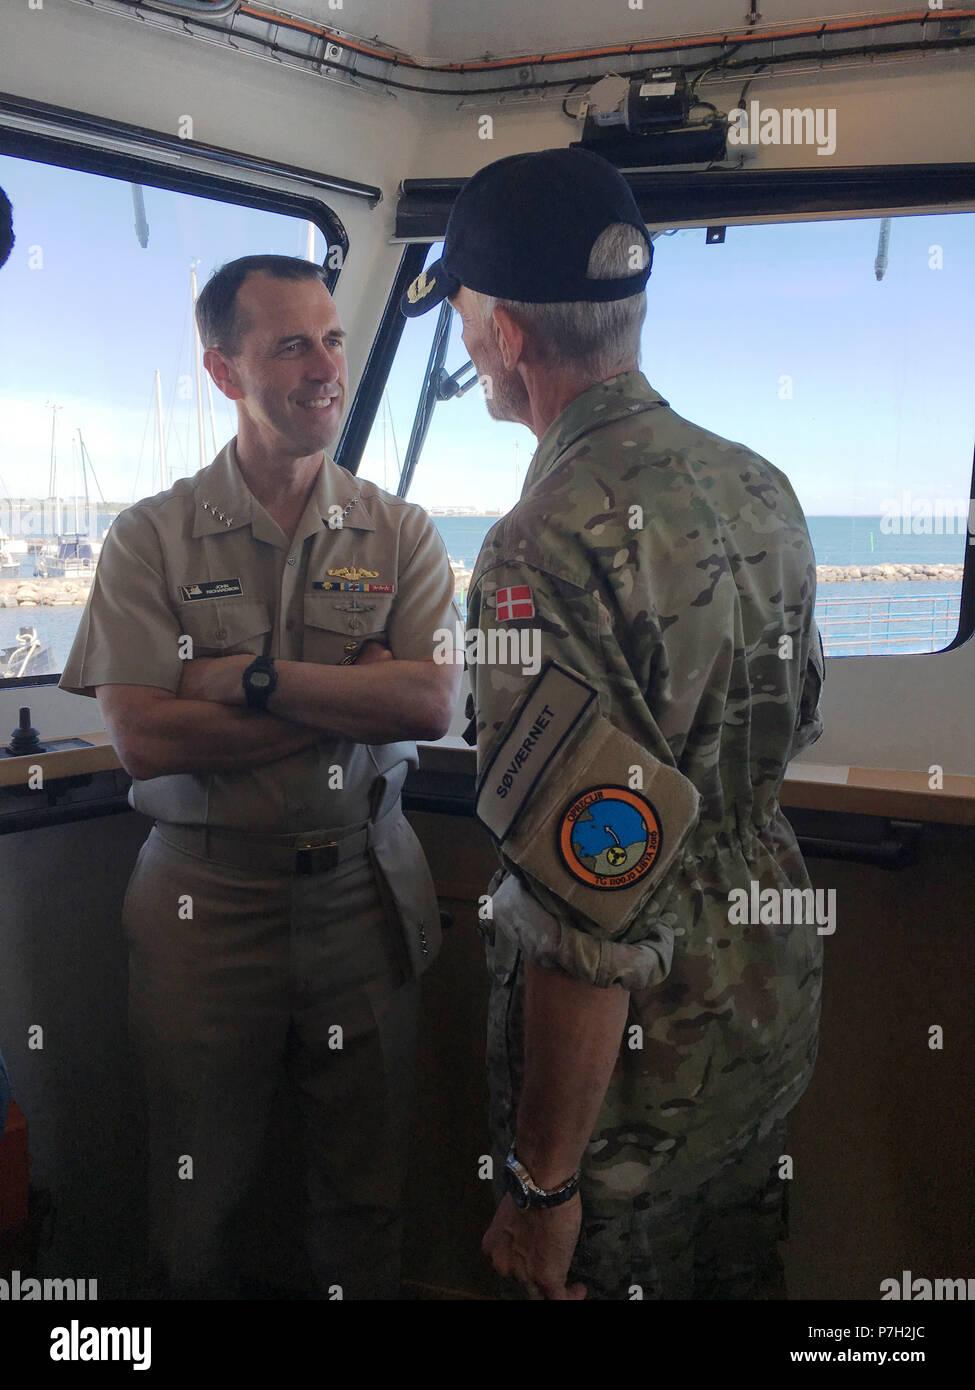 180627-N-ES994-002 COPENHAGEN, Denmark (June 27, 2019) Chief